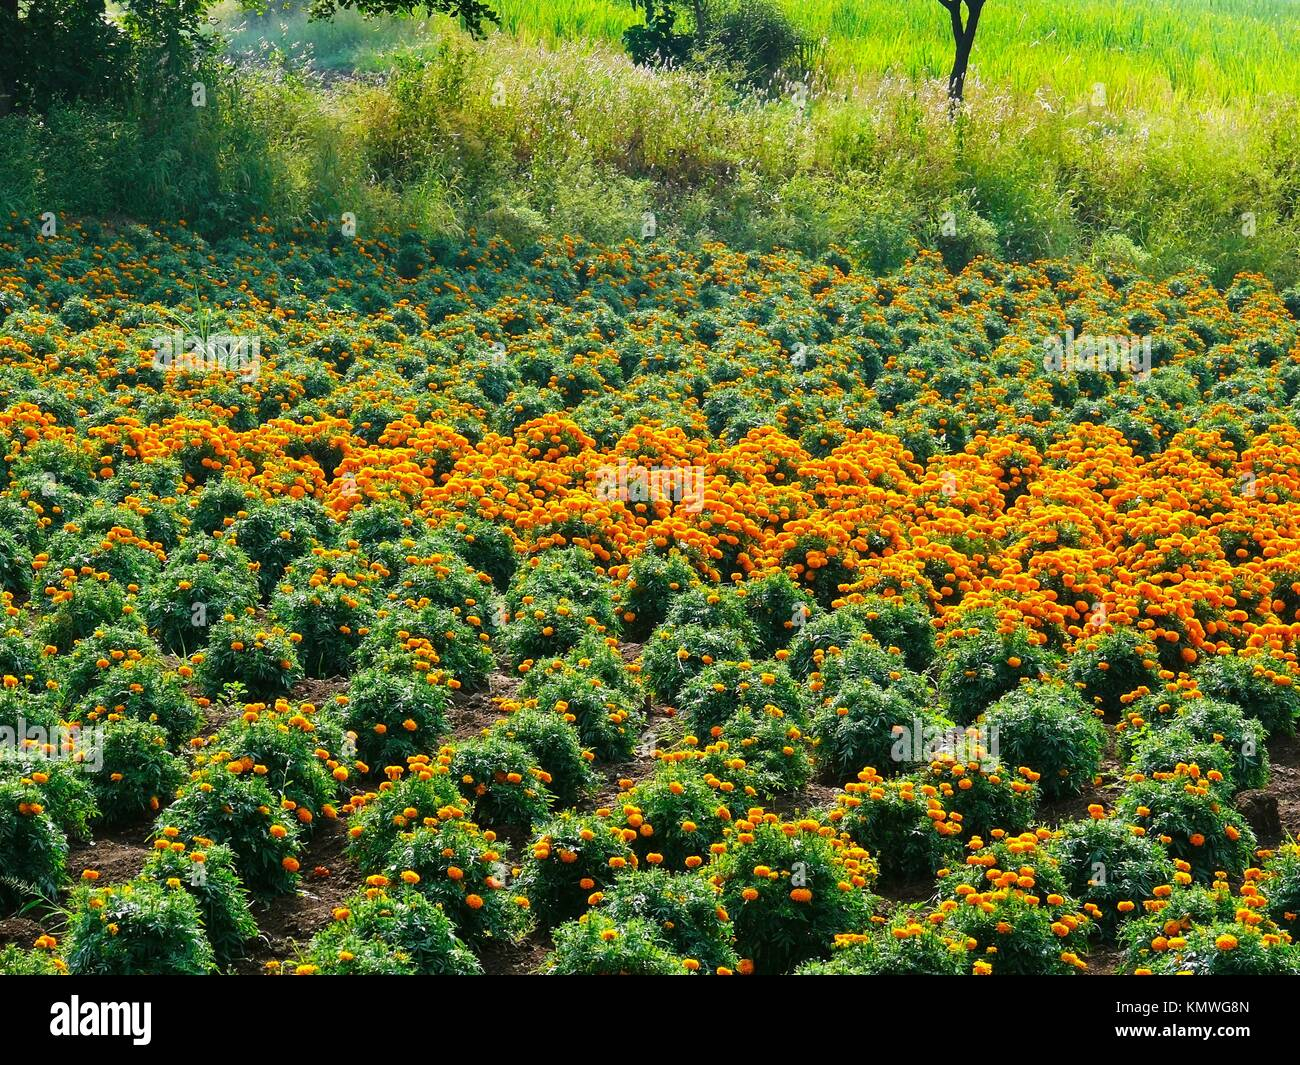 Marigold flowers, Tagetes erecta, Asteraceae - Stock Image